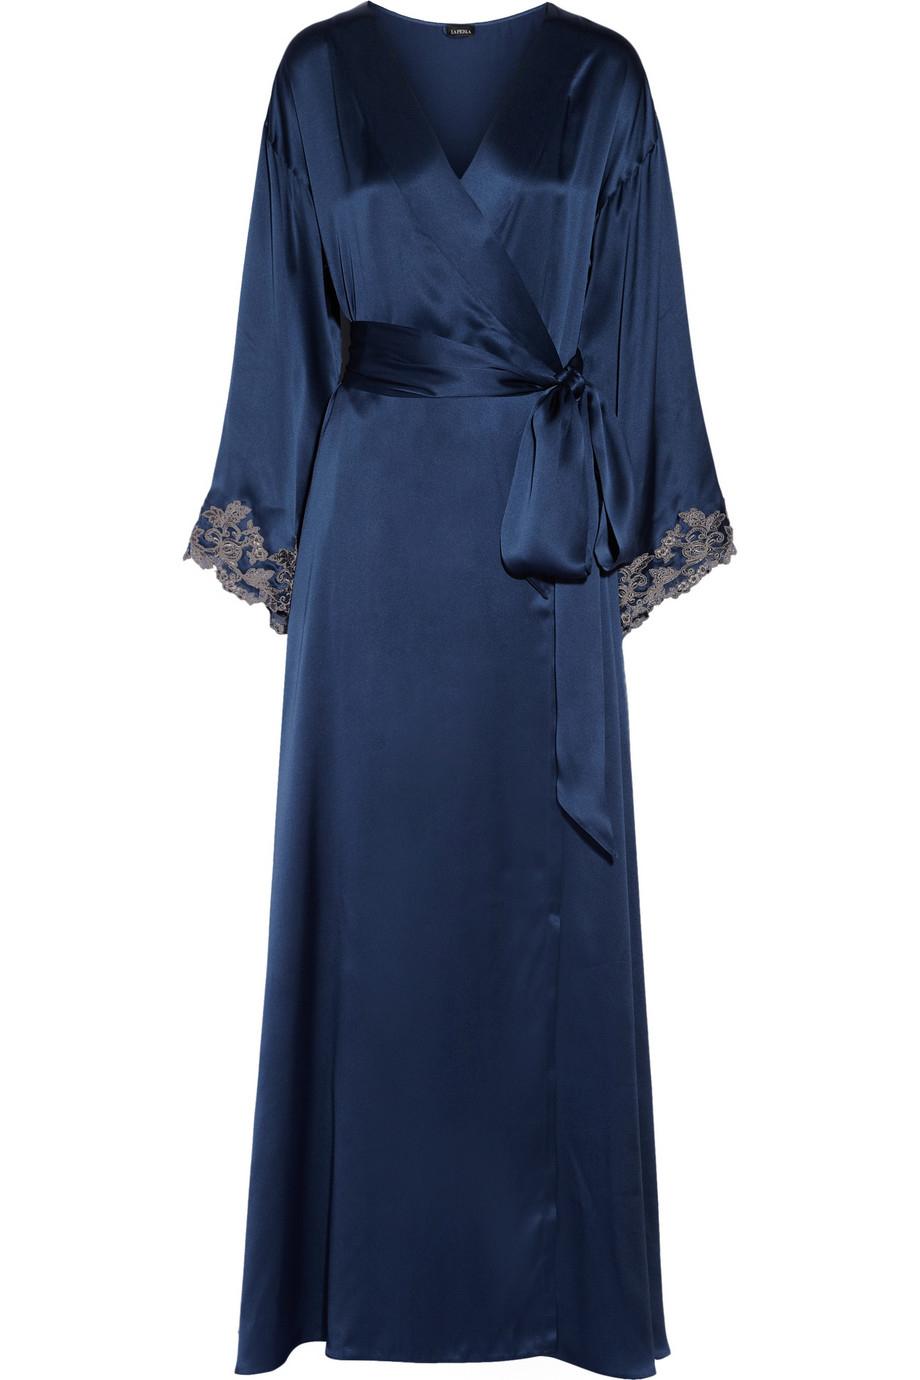 la perla maison lace trimmed silk satin robe in blue lyst. Black Bedroom Furniture Sets. Home Design Ideas